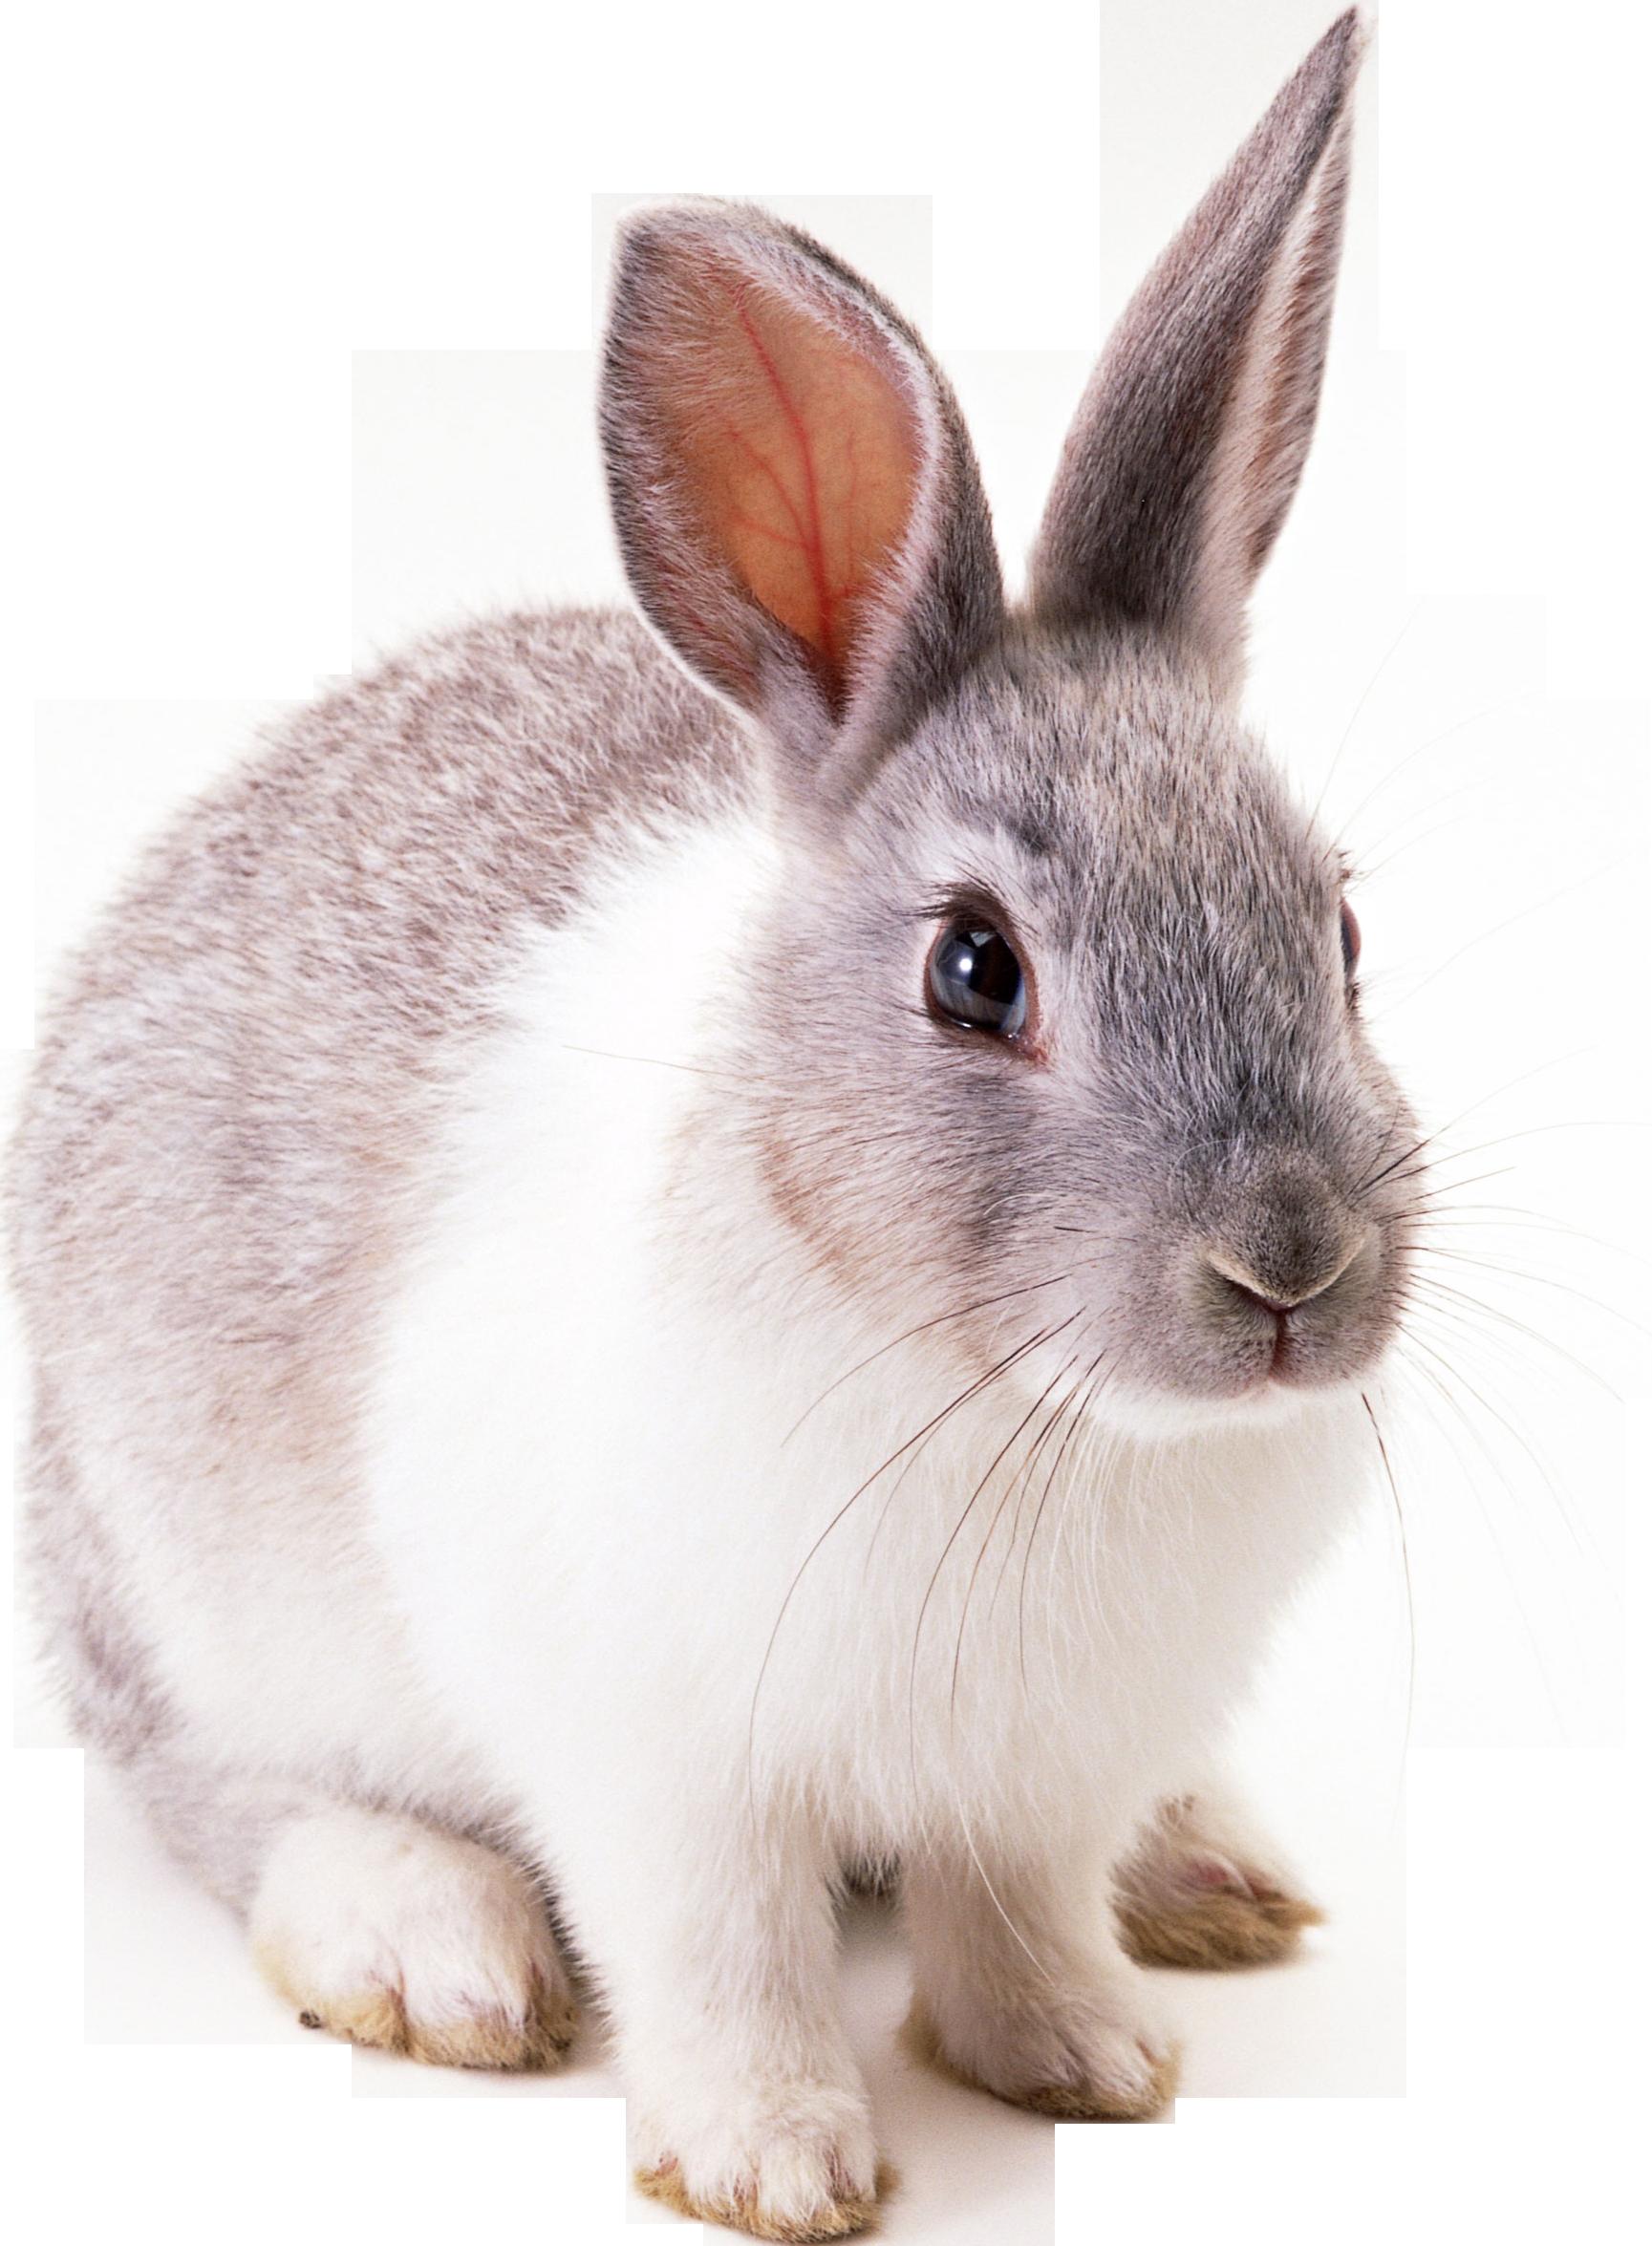 Clipart bunny couple. Rabbit hd png transparent